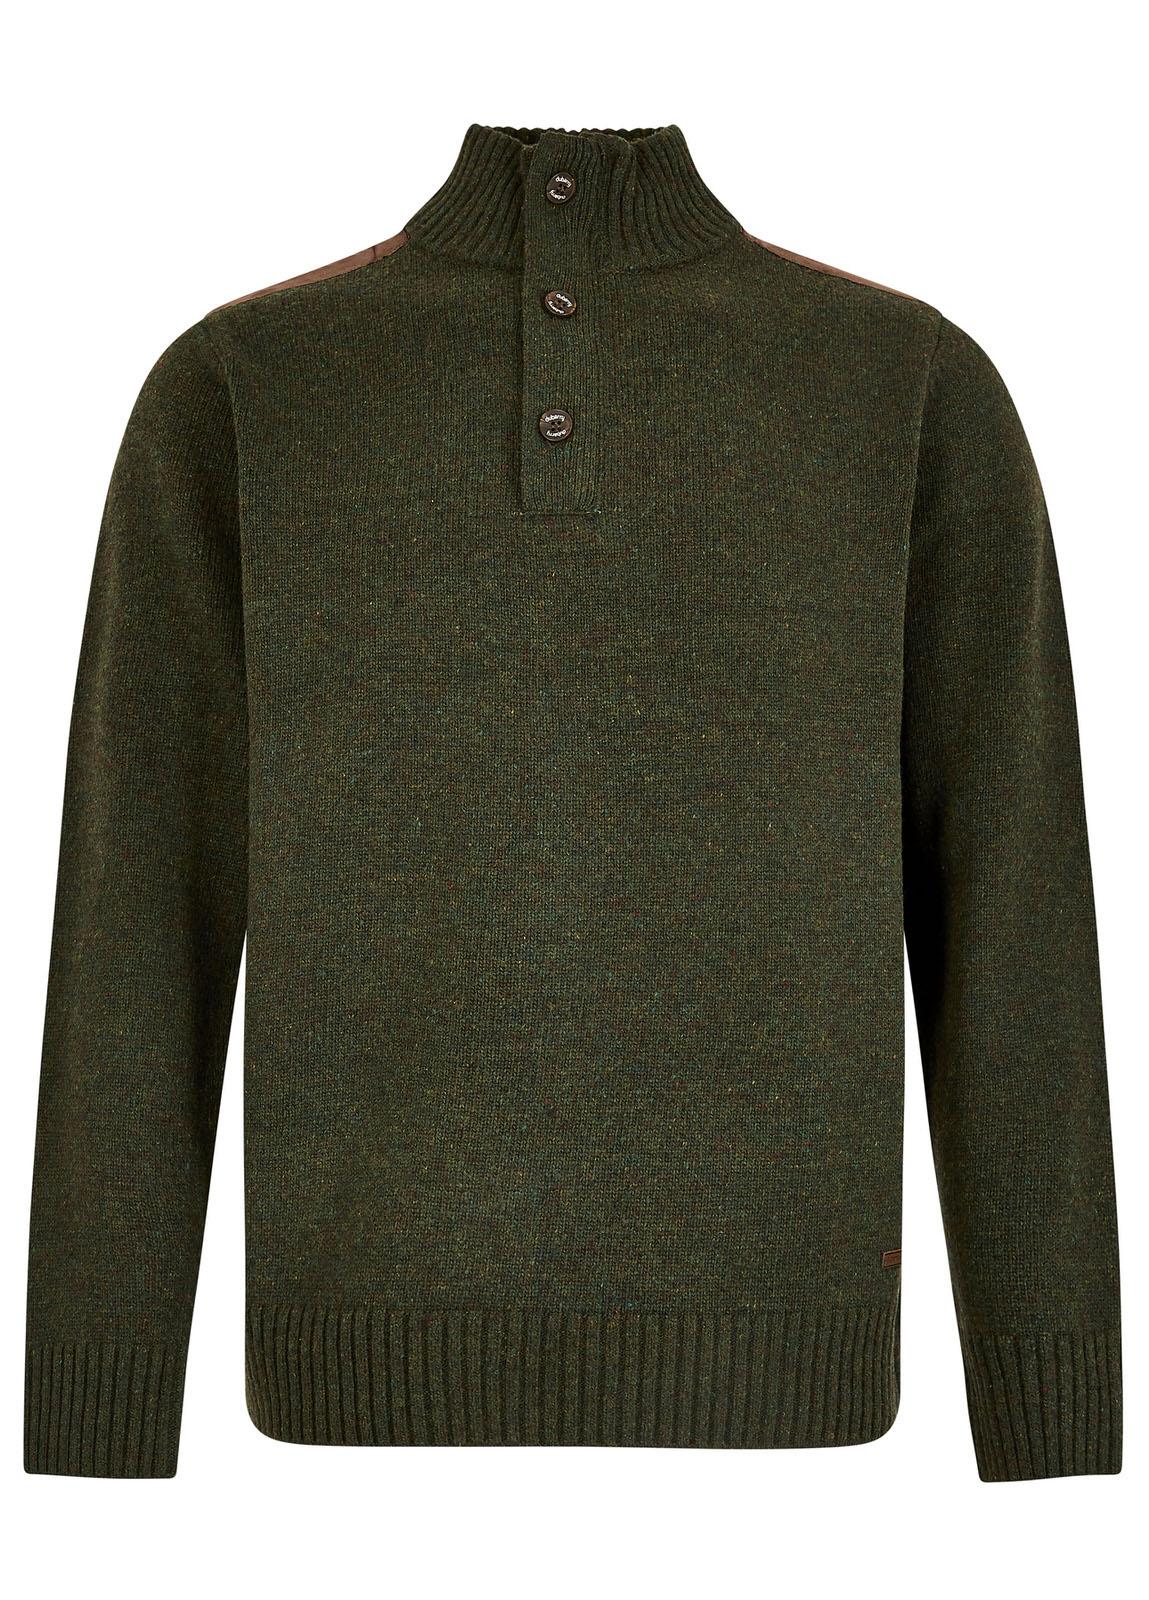 Lambert_Sweater_Olive_Image_1